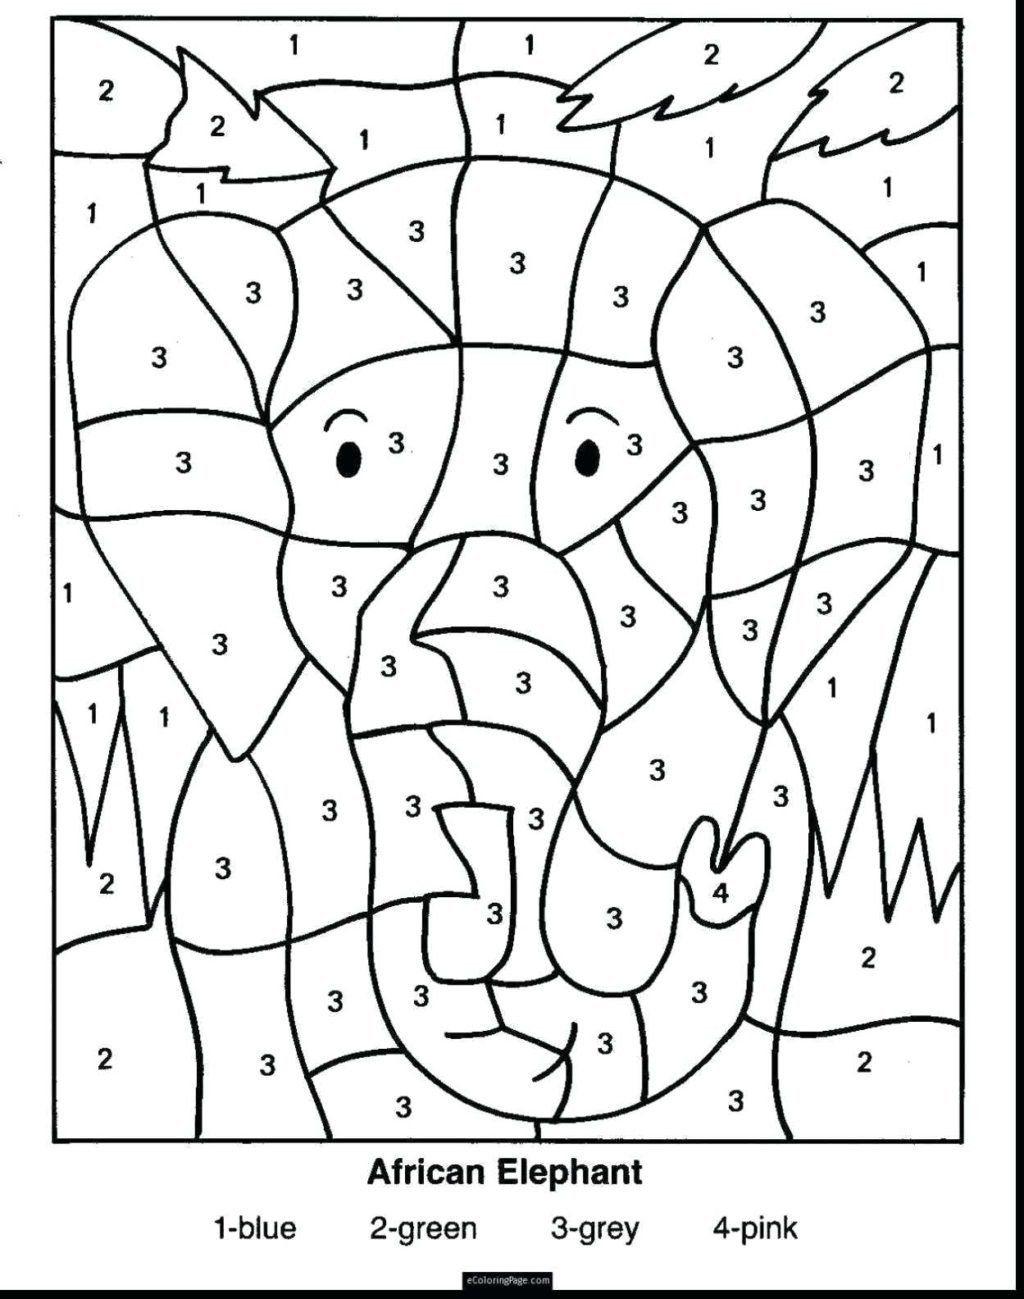 Multiplication Coloring Sheet 4th Grade Worksheet Reading Worskheets Multiplic In 2020 Math Coloring Worksheets Kindergarten Coloring Pages Addition Coloring Worksheet